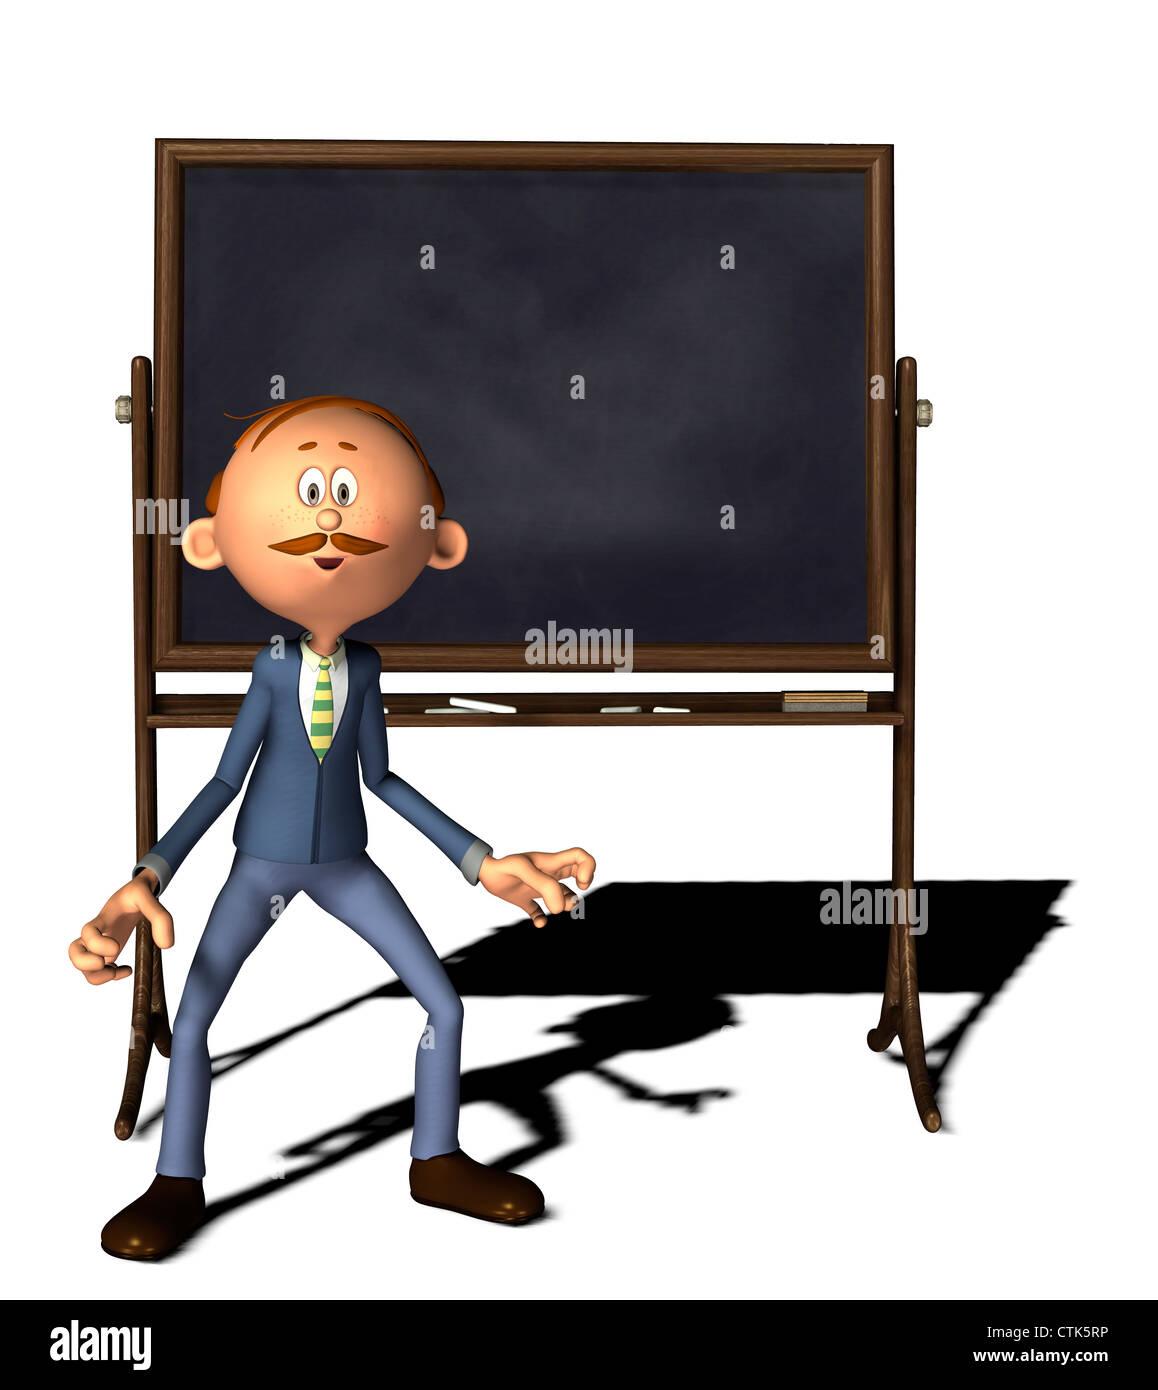 Cartoonfigur Lehrer Mit Tafel / cartoon-Figur Lehrer mit BoardStockfoto